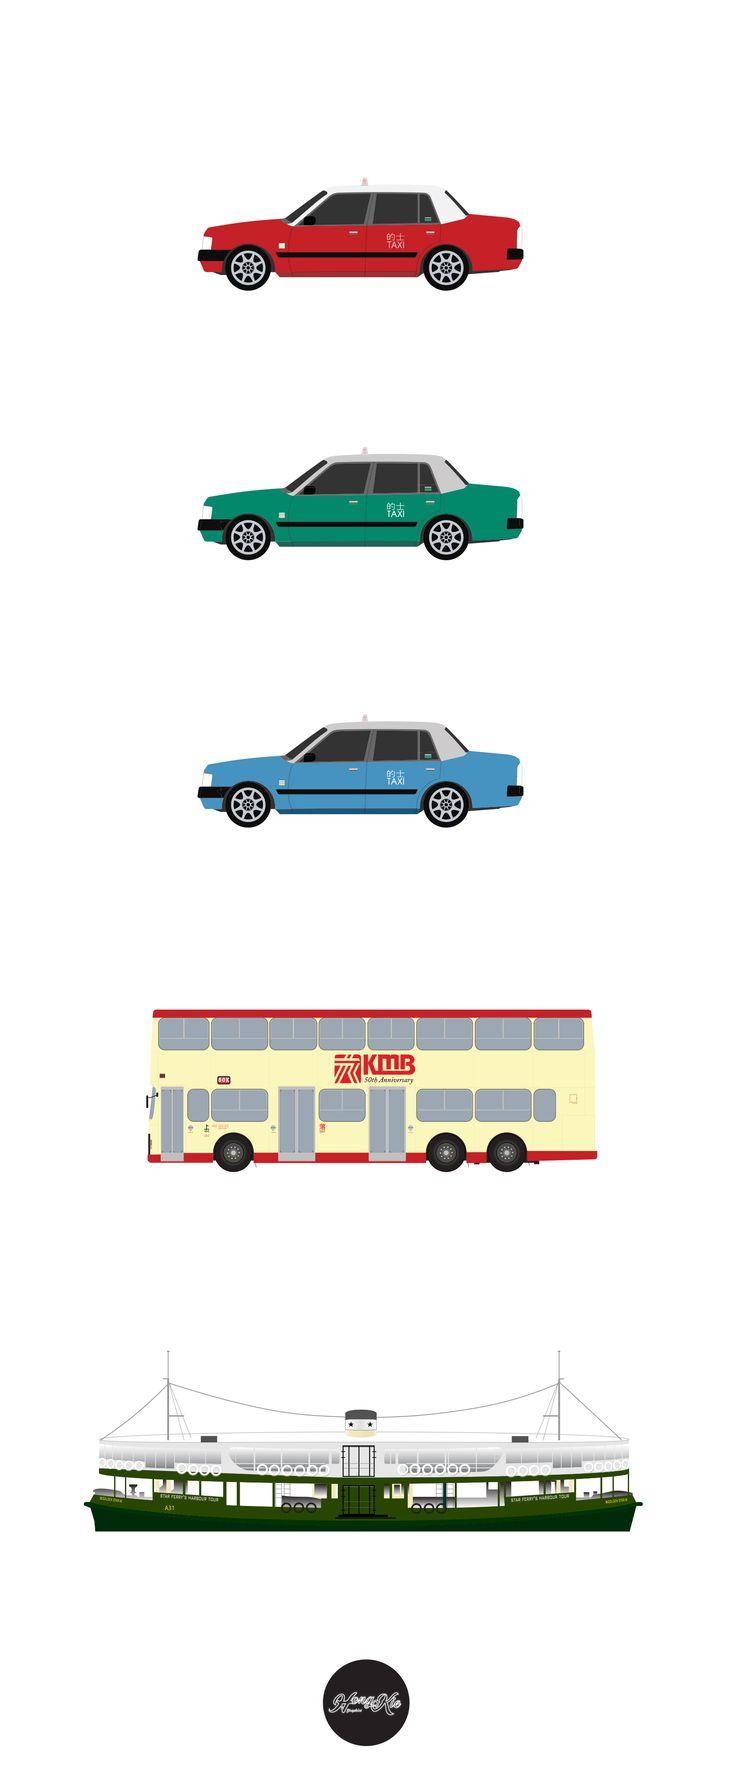 Hong Kong Style [Project 03] Hong Kong Transportation by Hilton Chau © HongKieGraphics 2017 #HongKong #Car #Ferry #Bus #Class #Illustration #Graphic #Art #Cantonese #English #Culture #Street